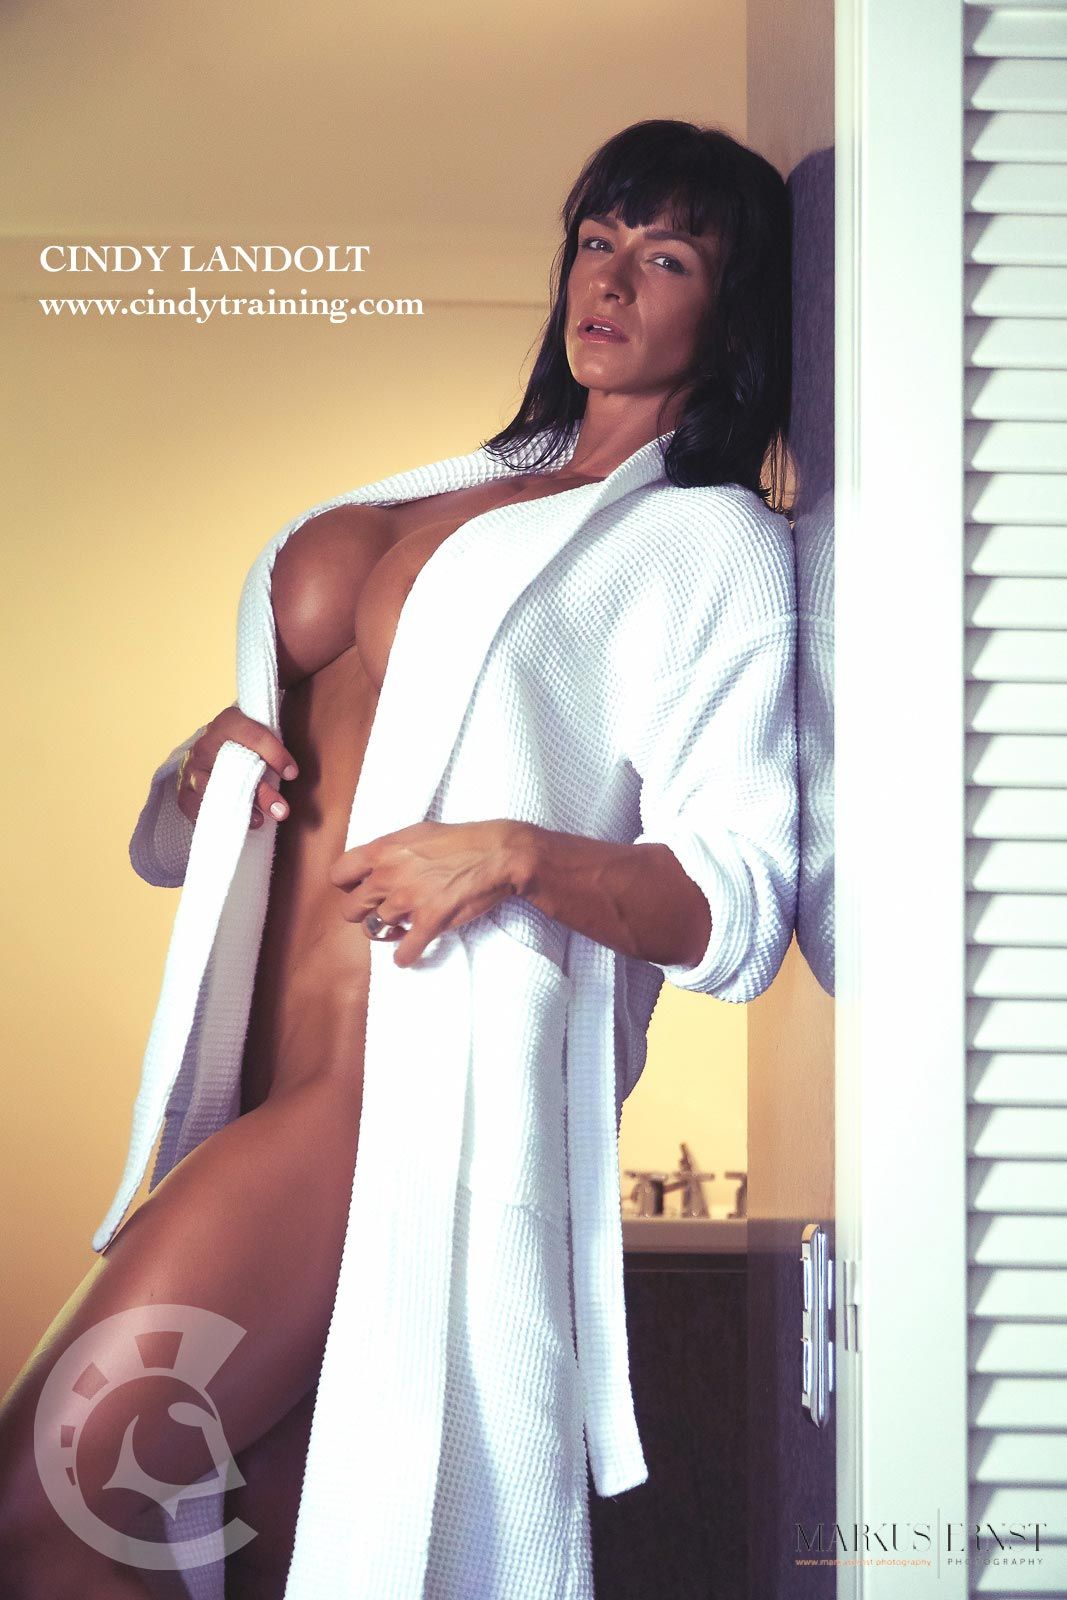 New Video and Images Bathroom online now  Cindy Landolt